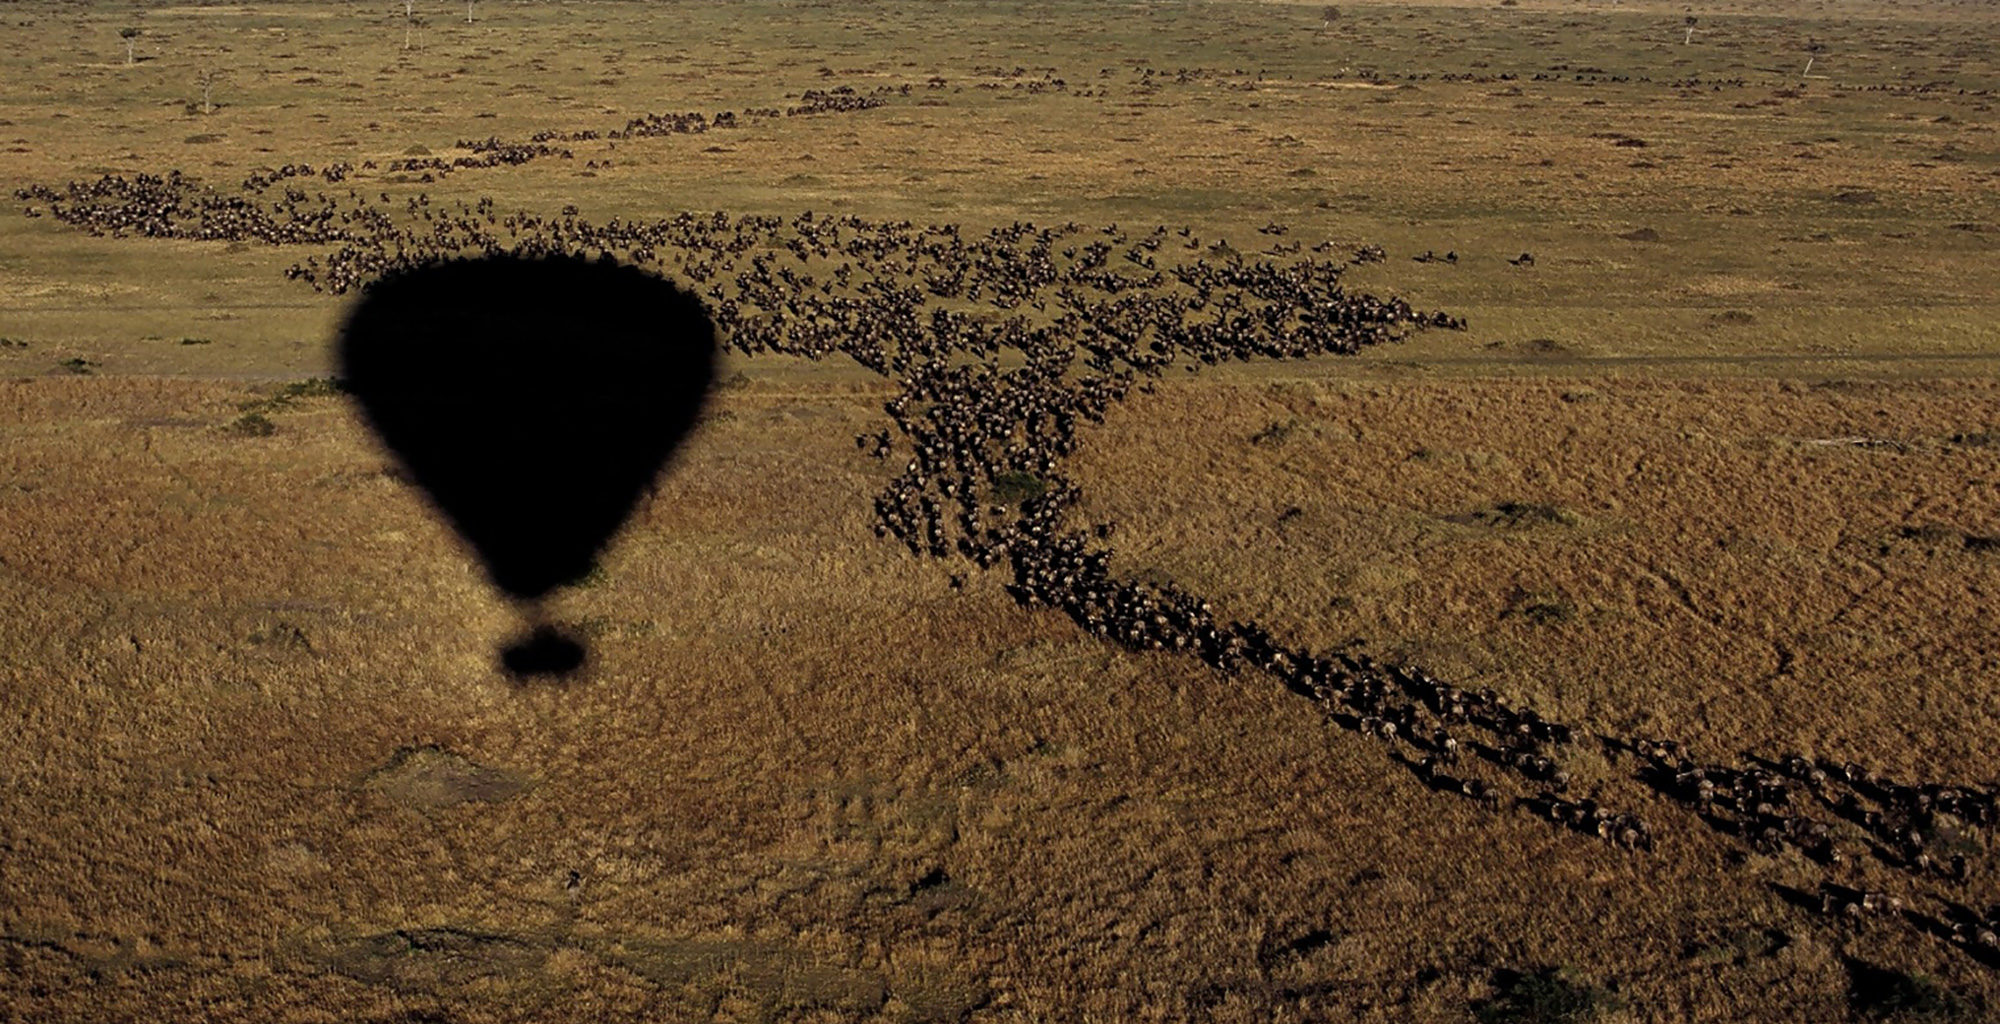 Masaai-Mara-Area-Migration-Hero